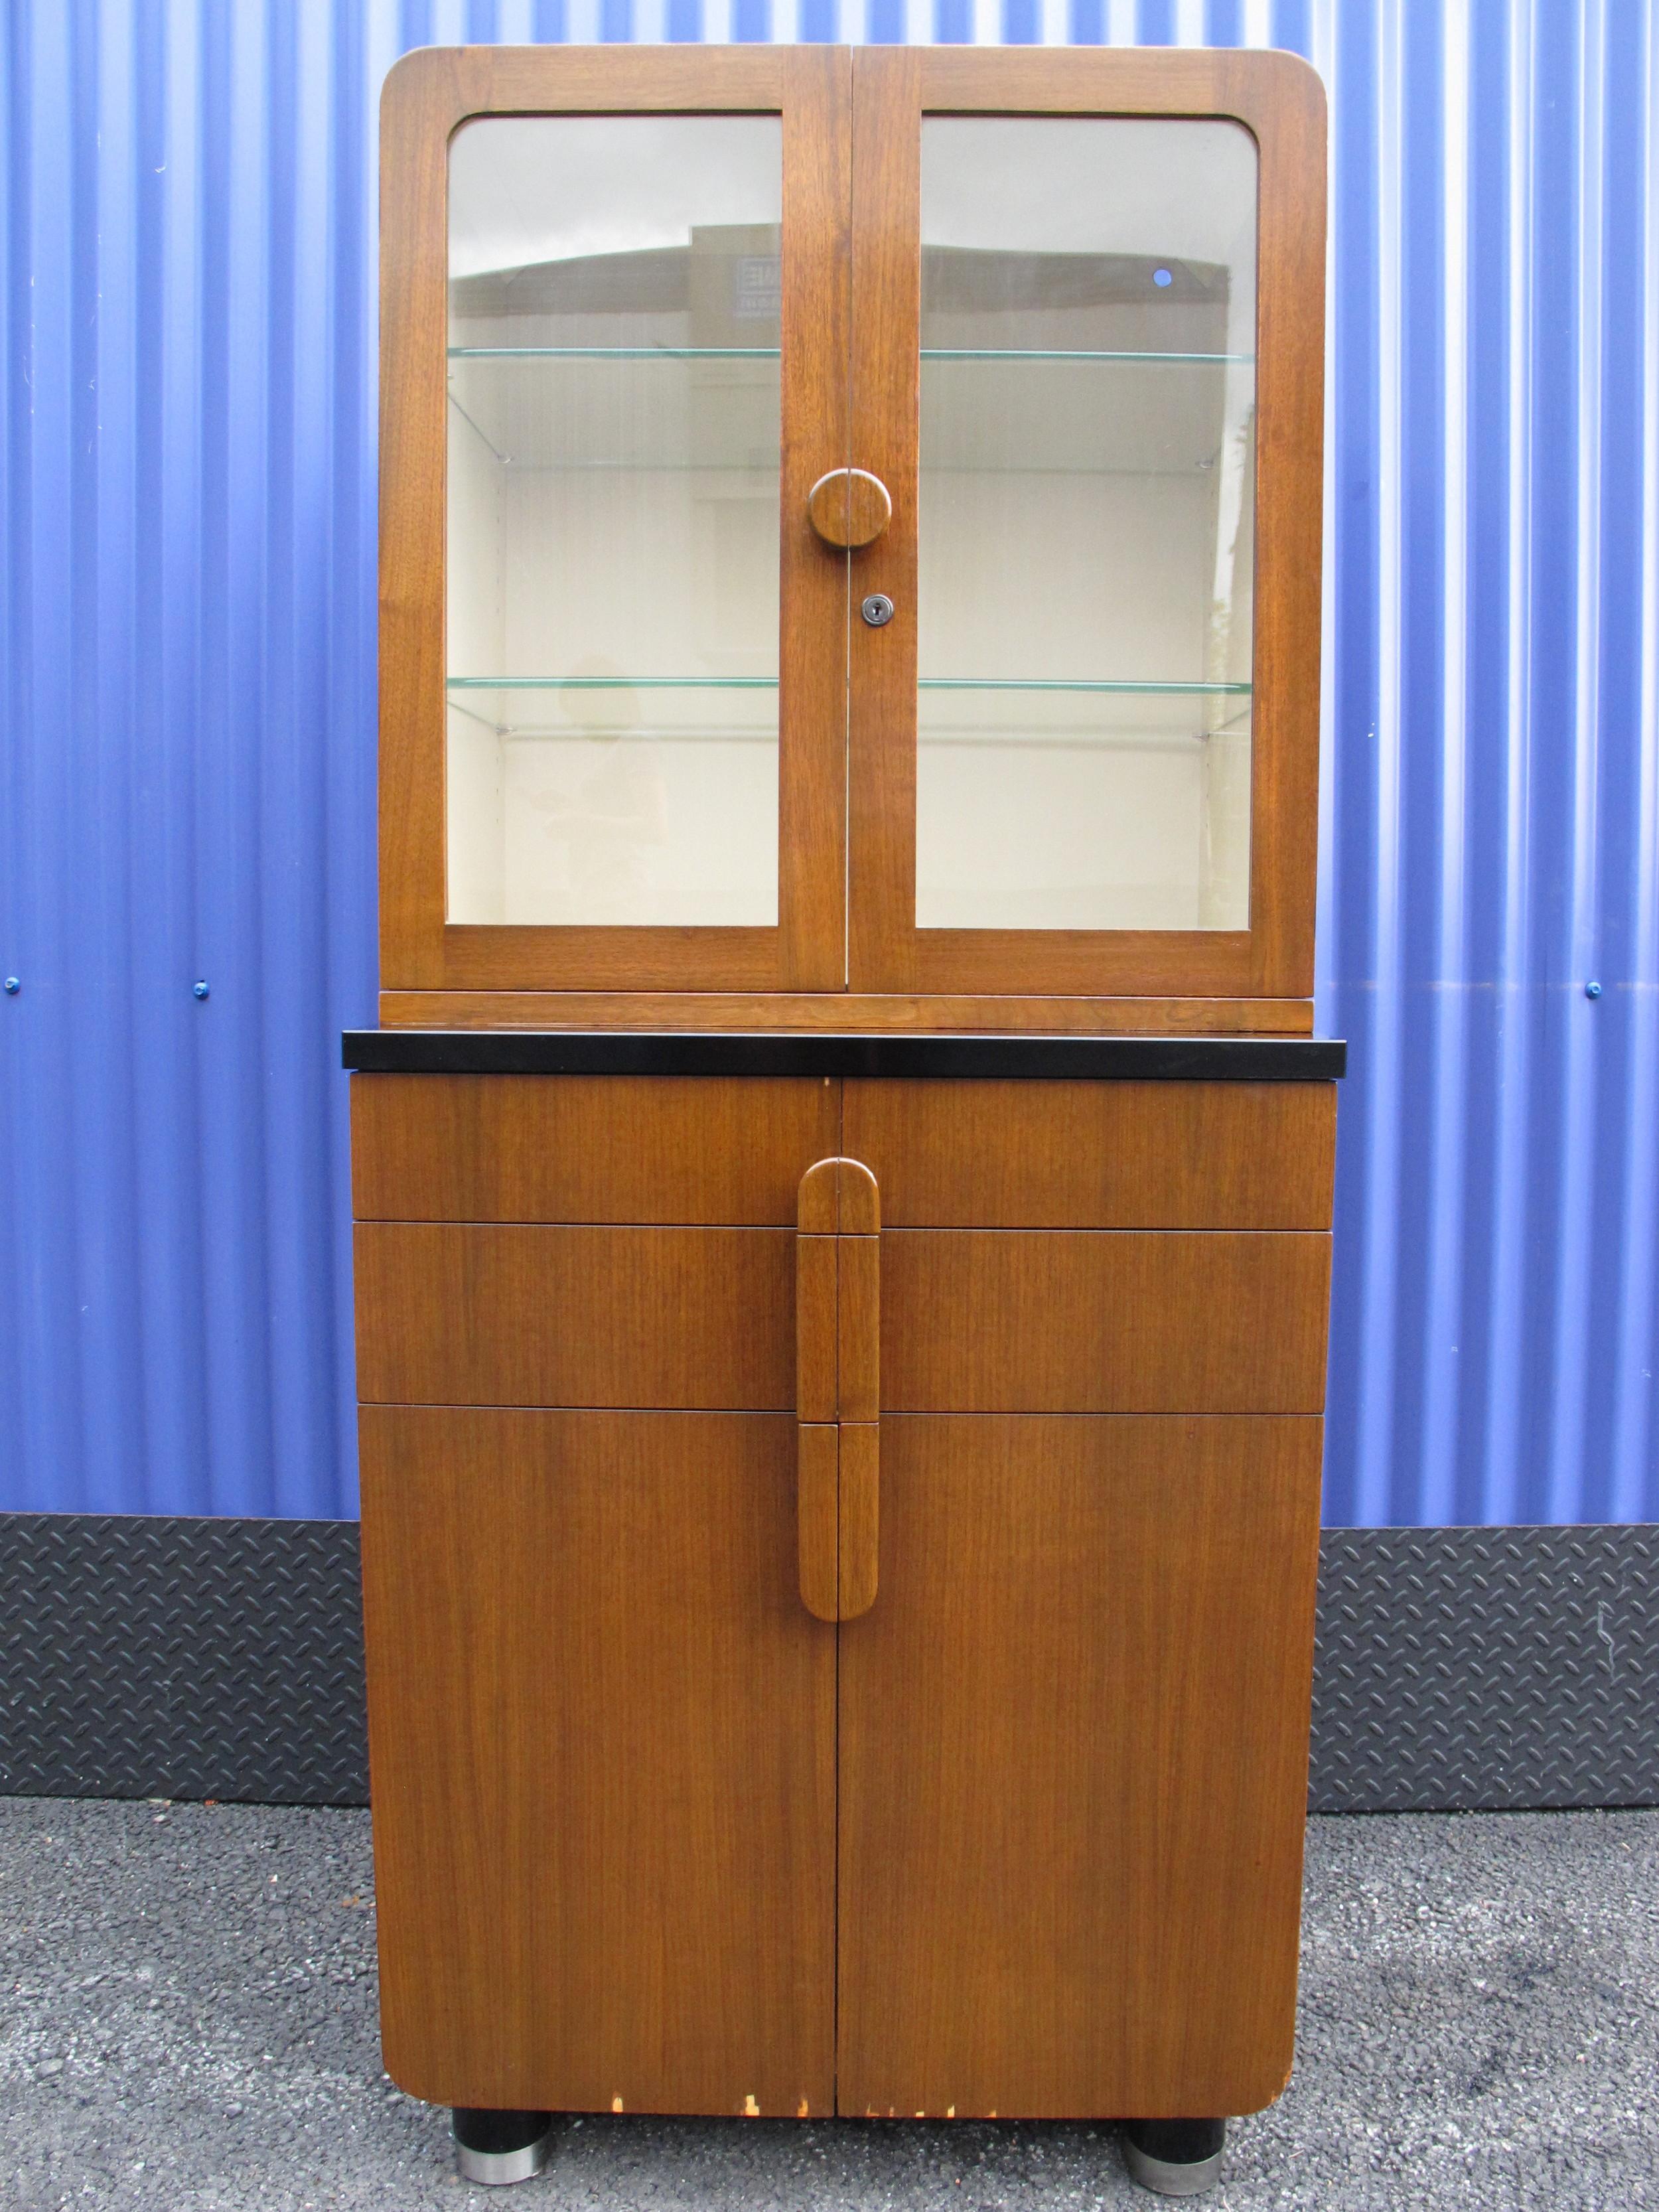 DECO HAMILTON GLASS-DOORED CABINET